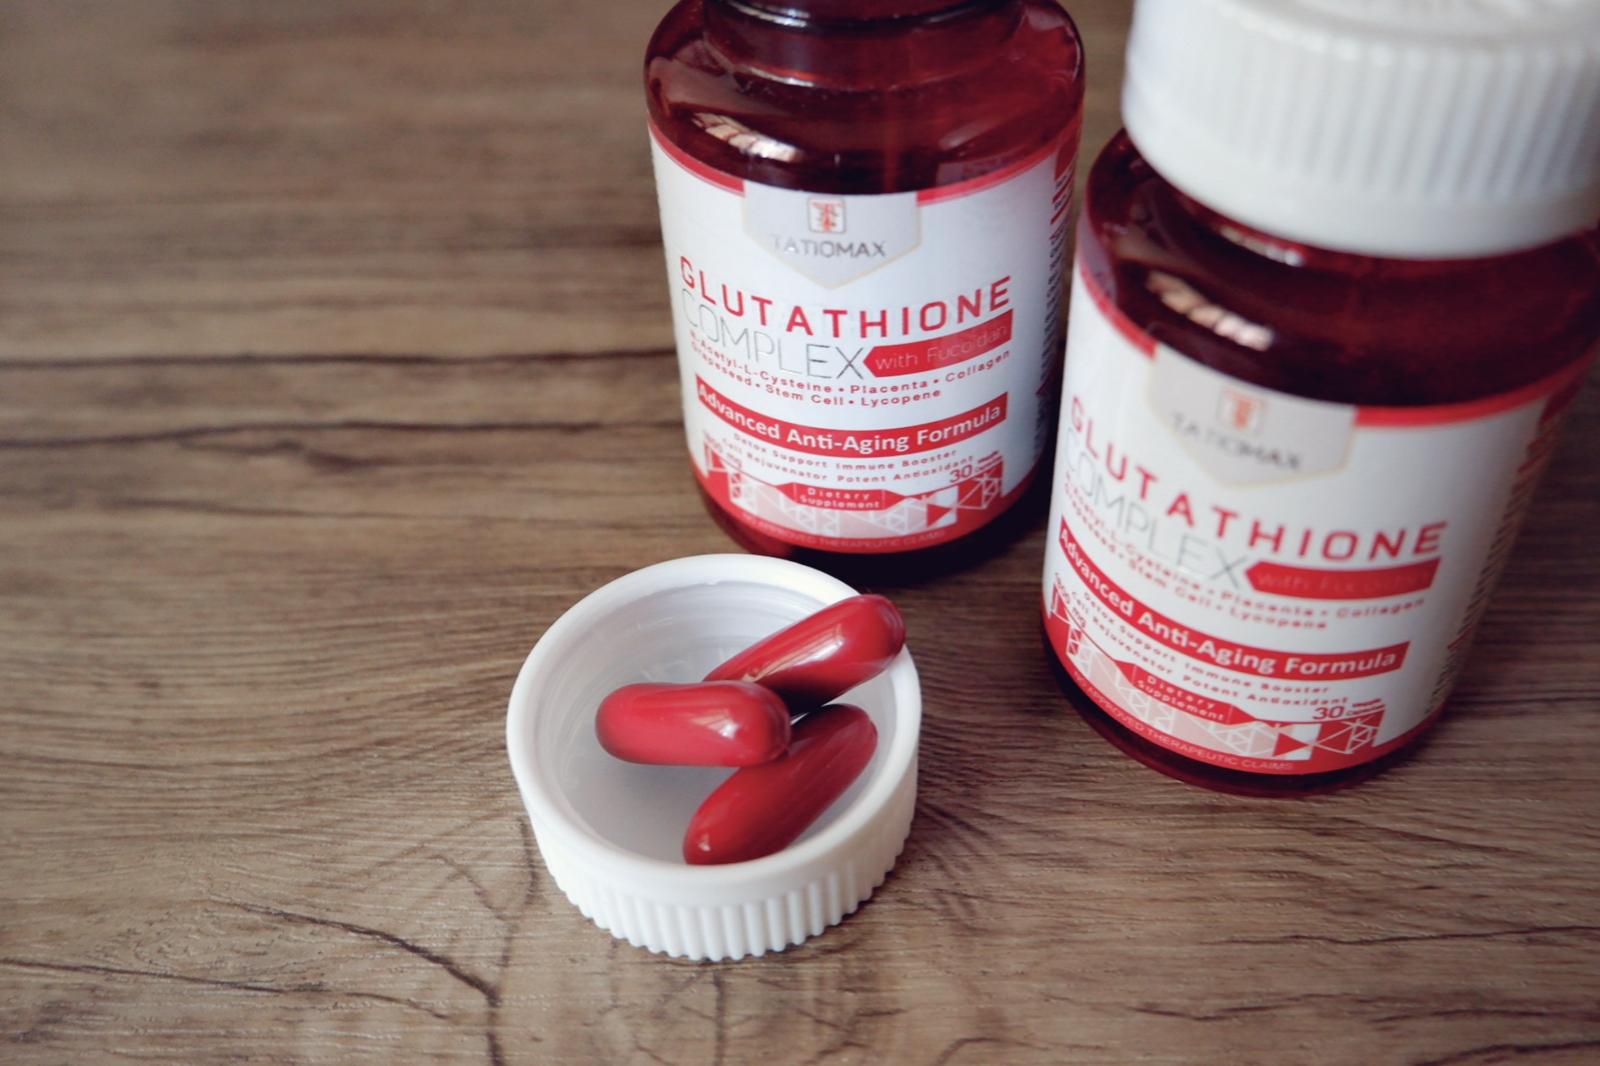 Tatiomax Glutathione Complex with Fucoidan